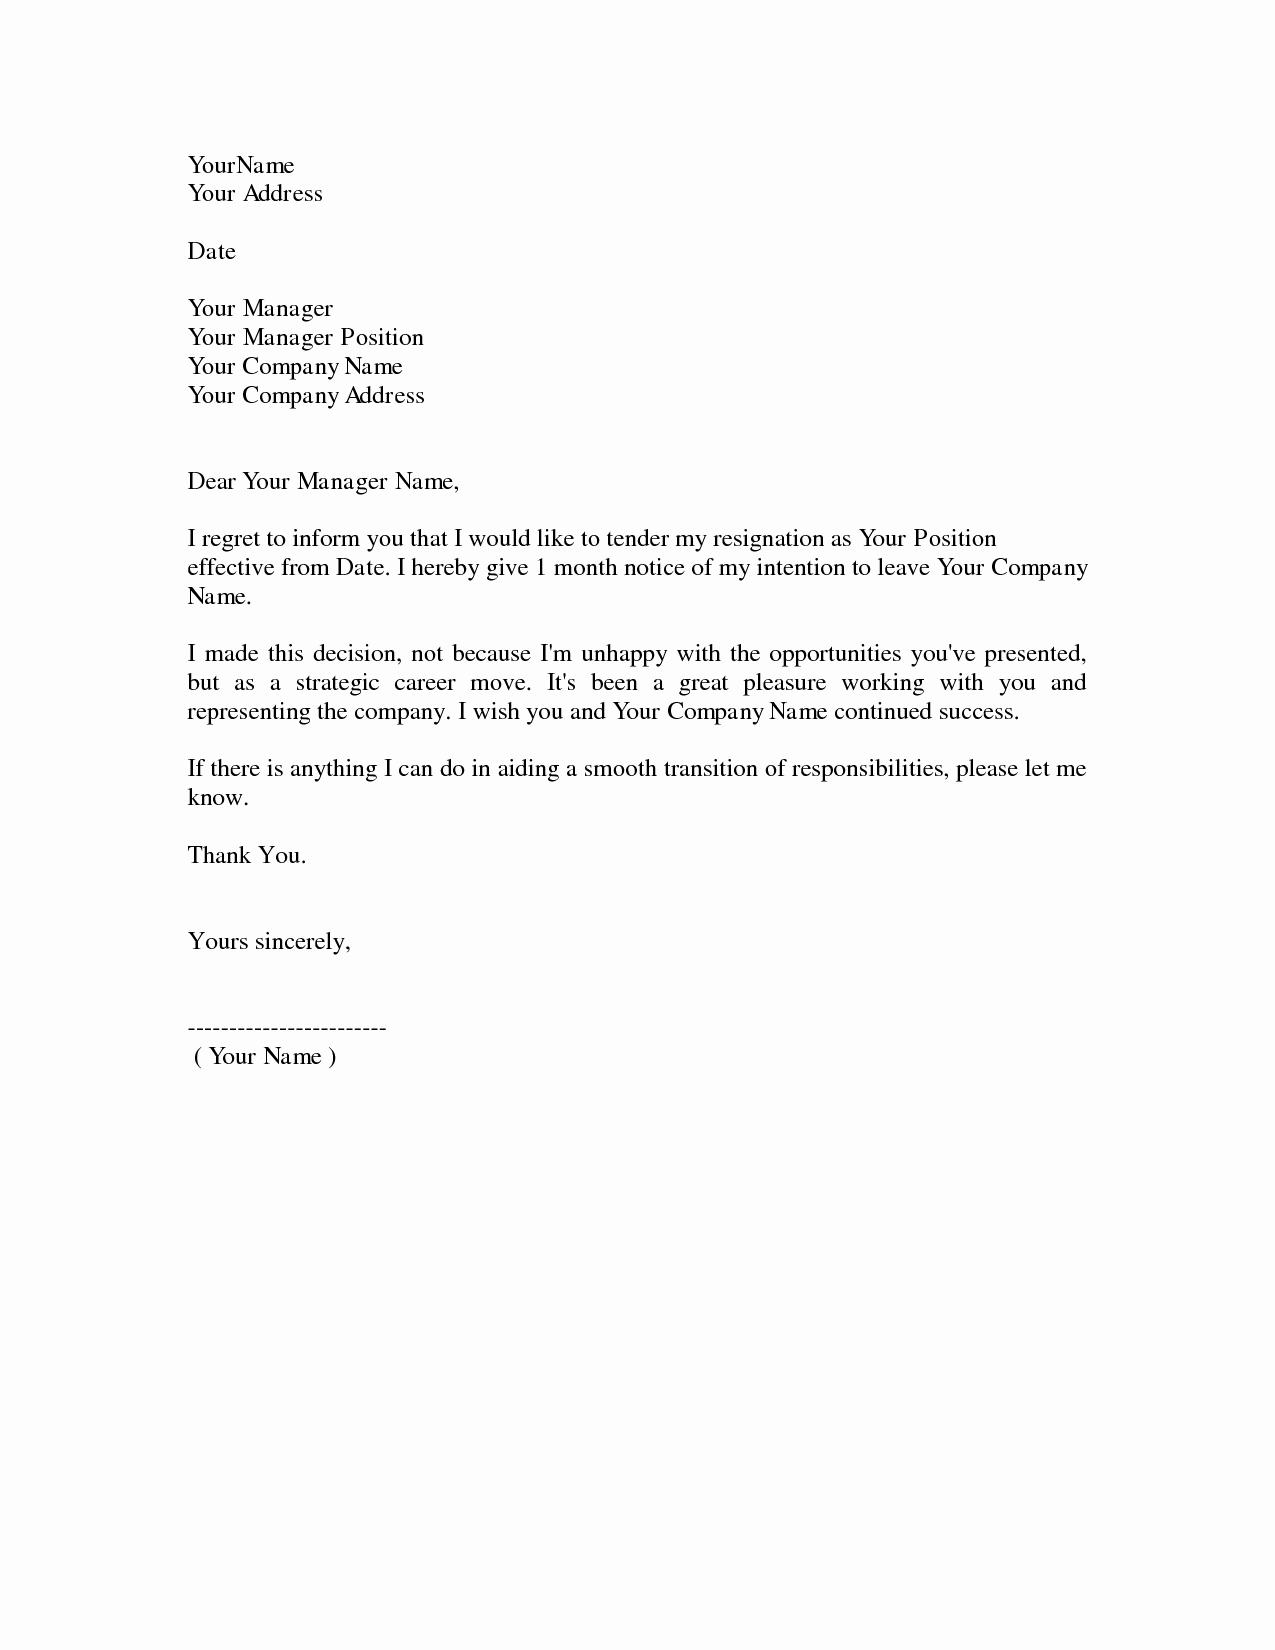 Resignation Letter Samples 0009 Future Ideas